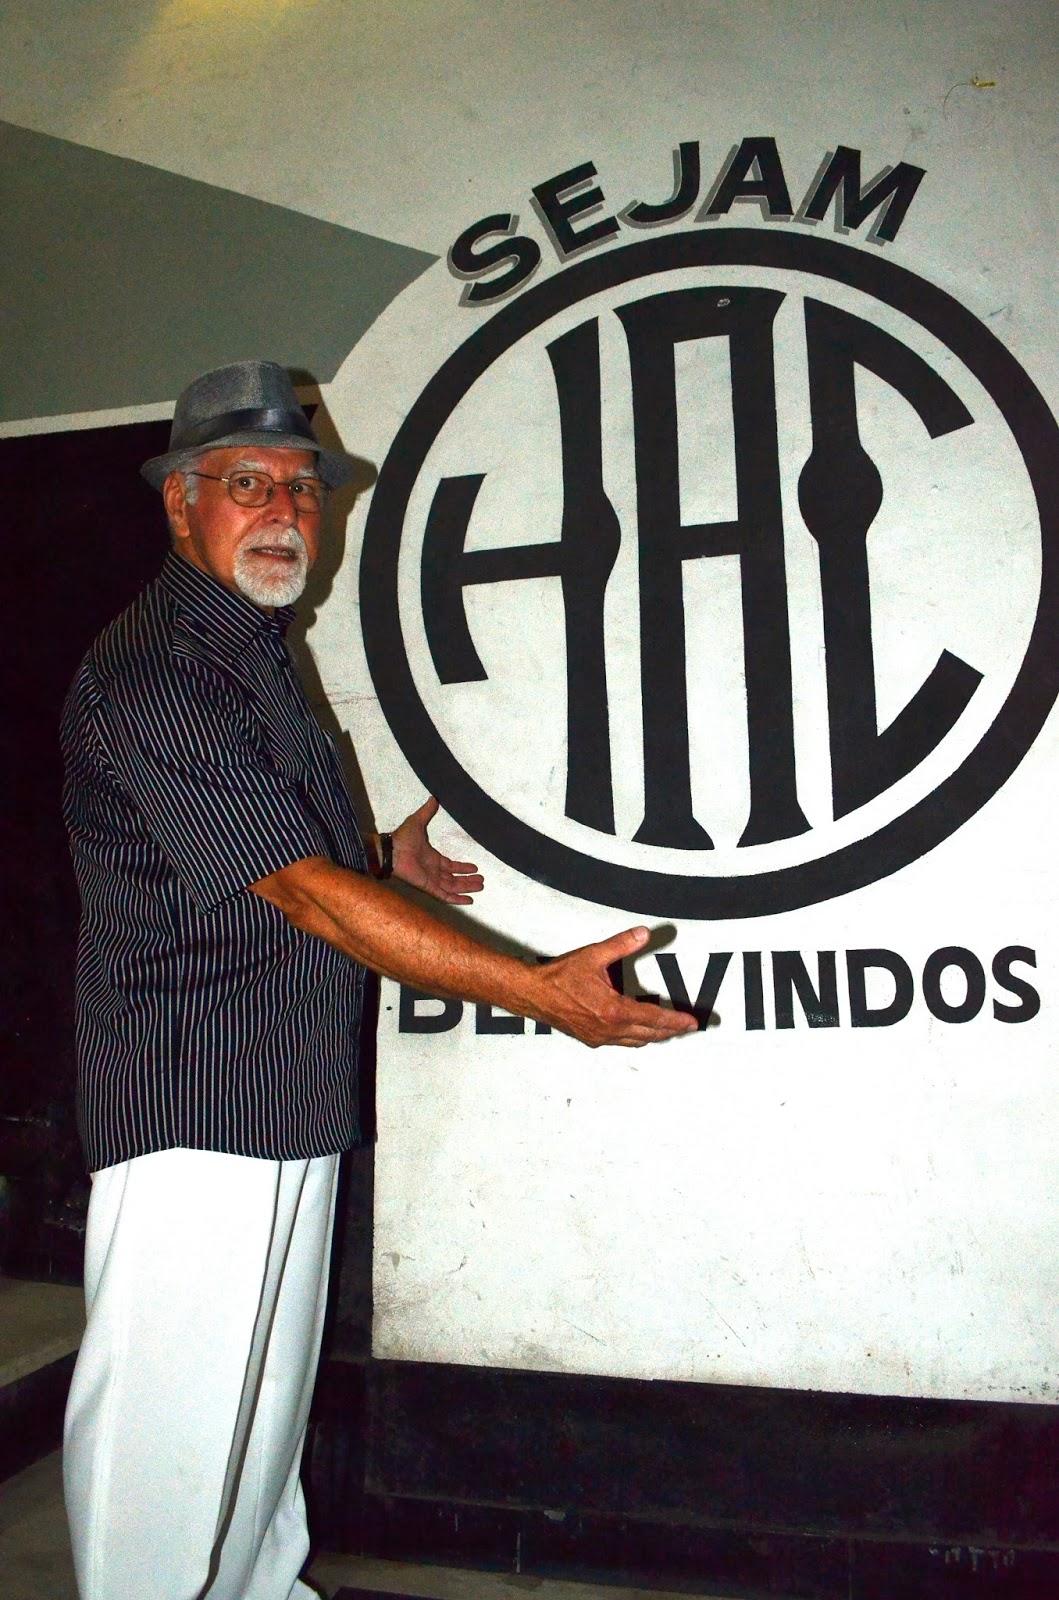 81 anos: Humaitá lotou a sede do clube